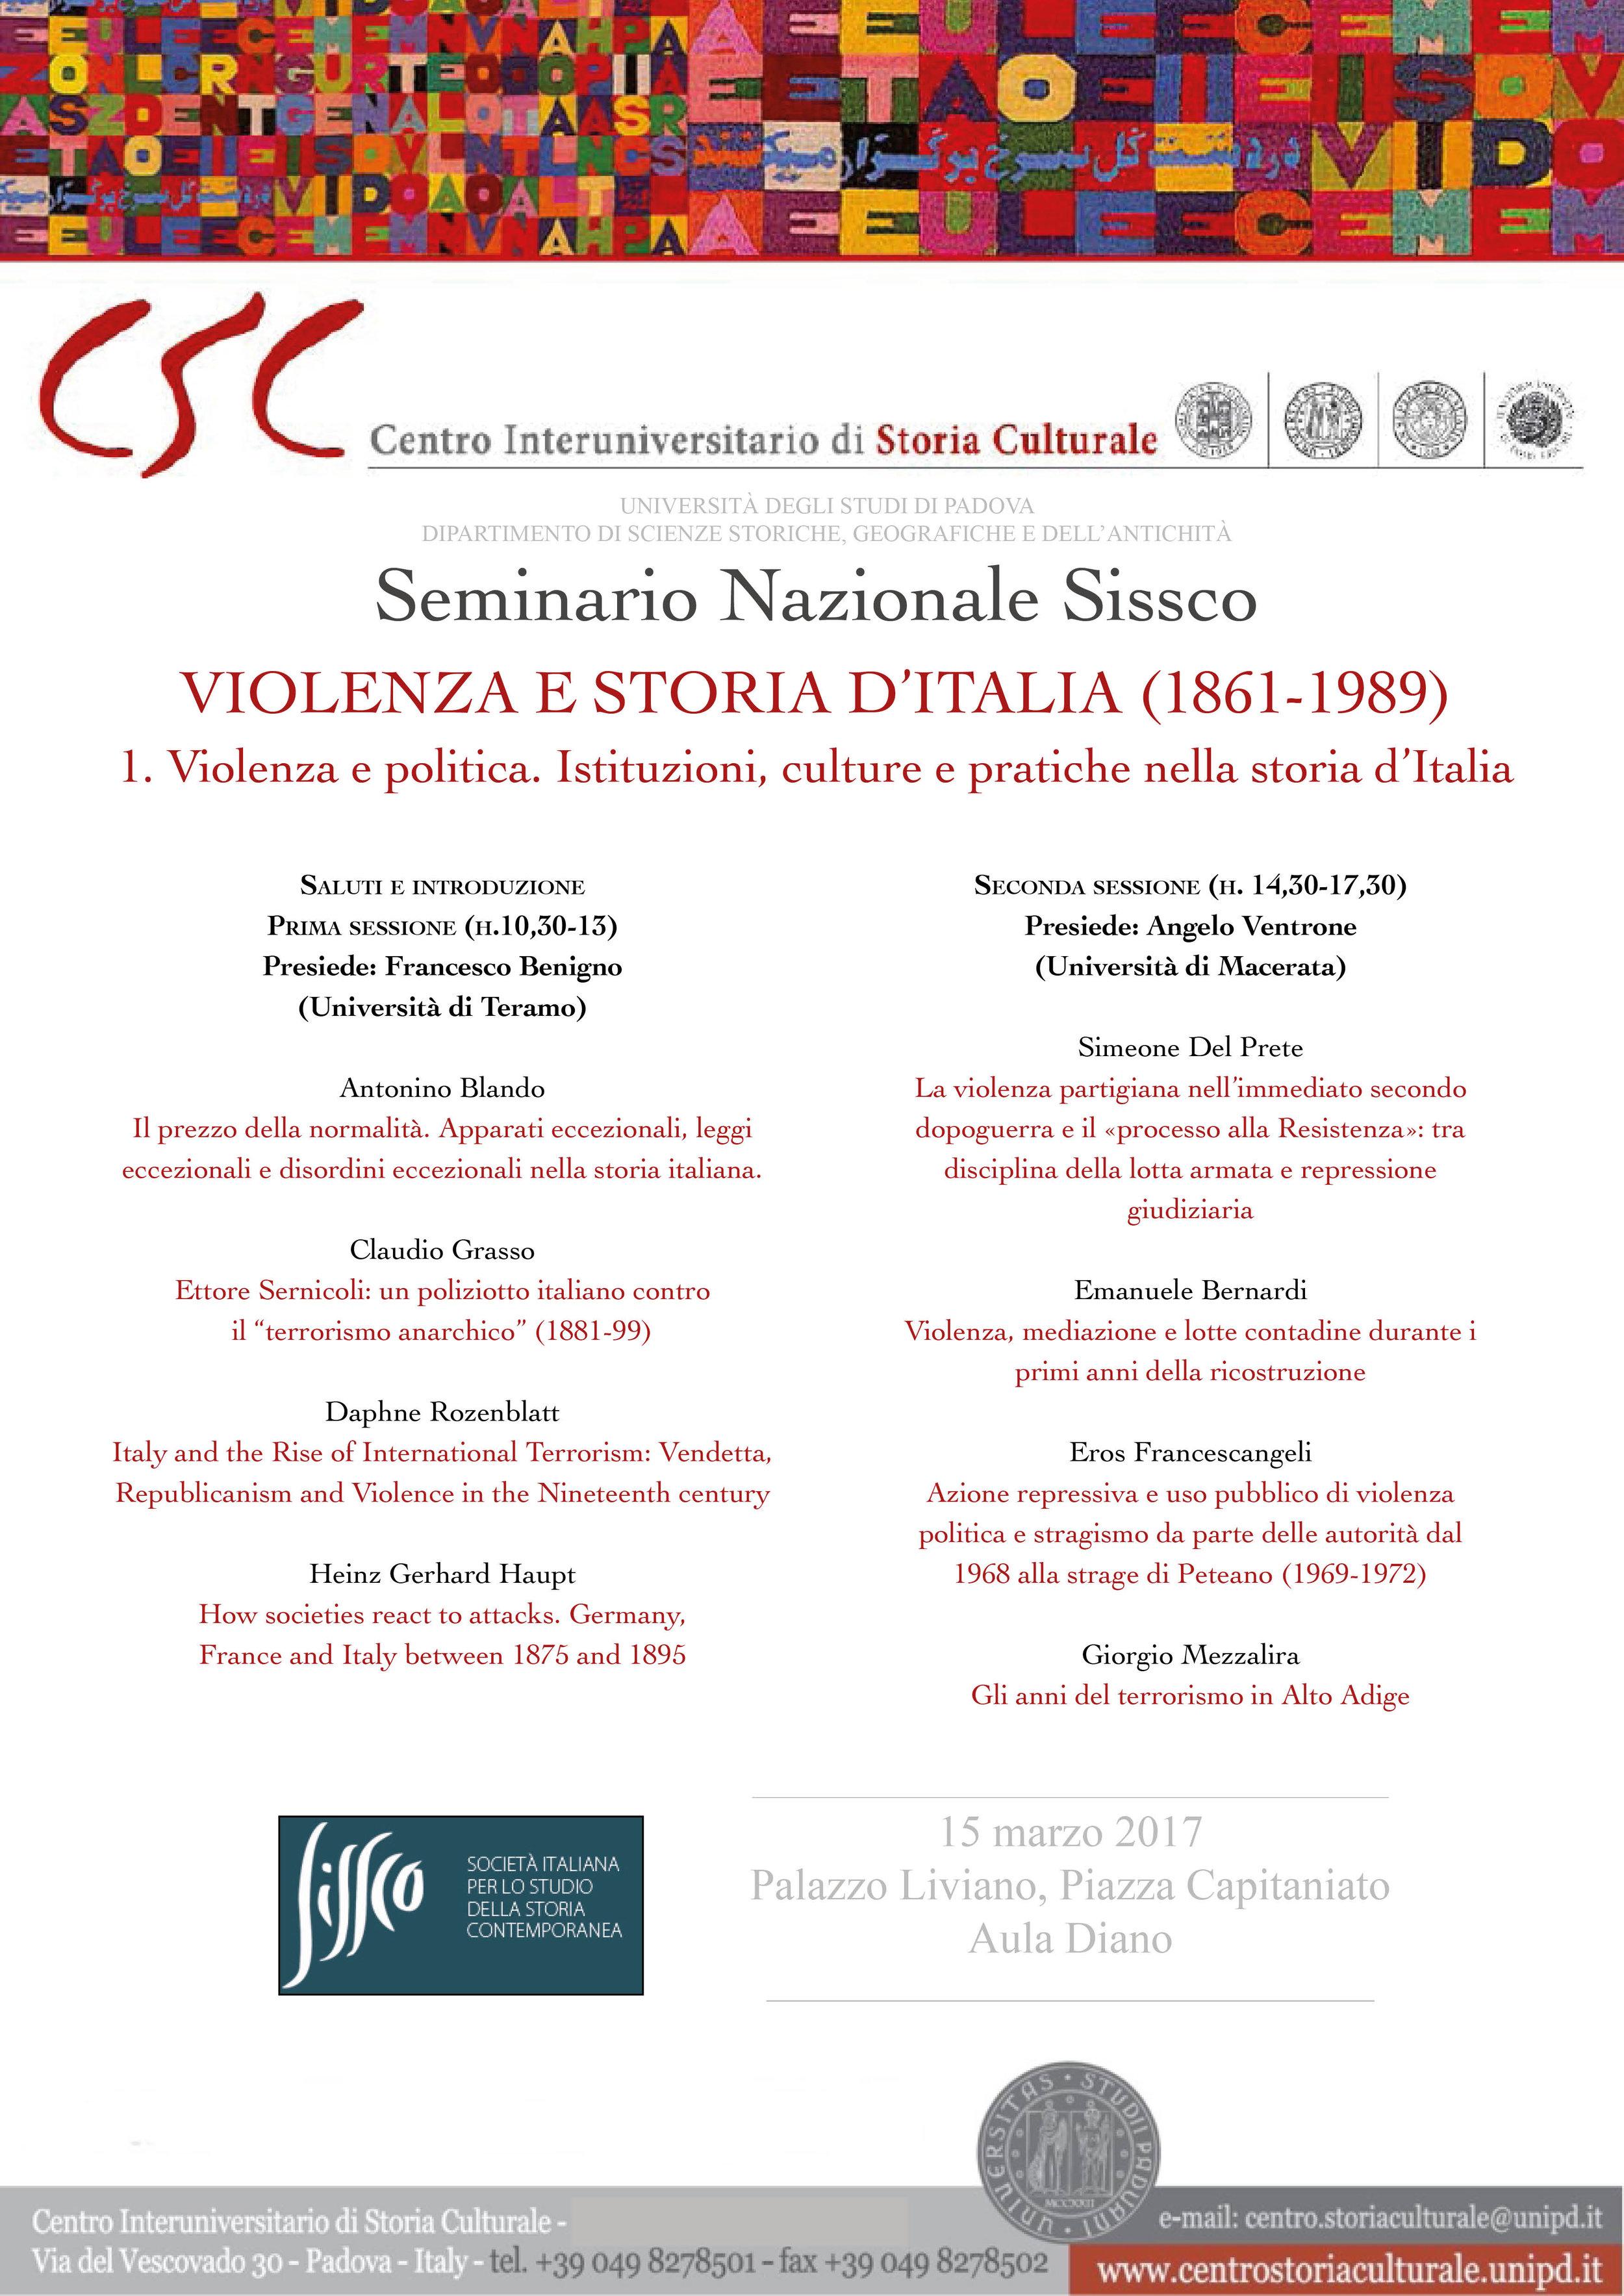 VIOLENZA E STORIA DITALIA4.jpg